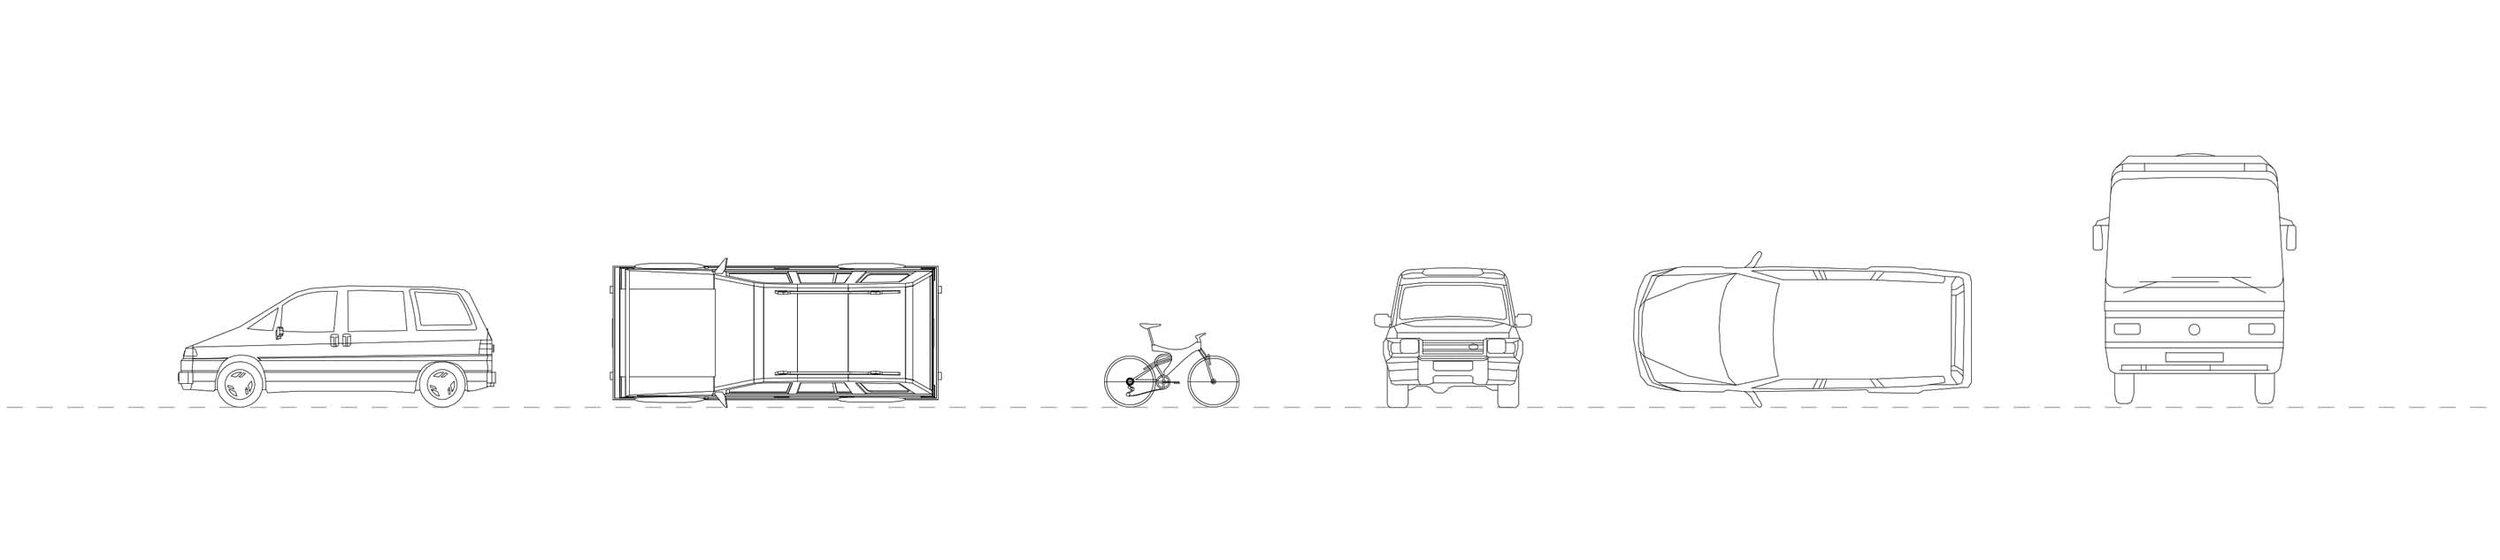 Free_CAD_Vehicles _Blocks.jpg